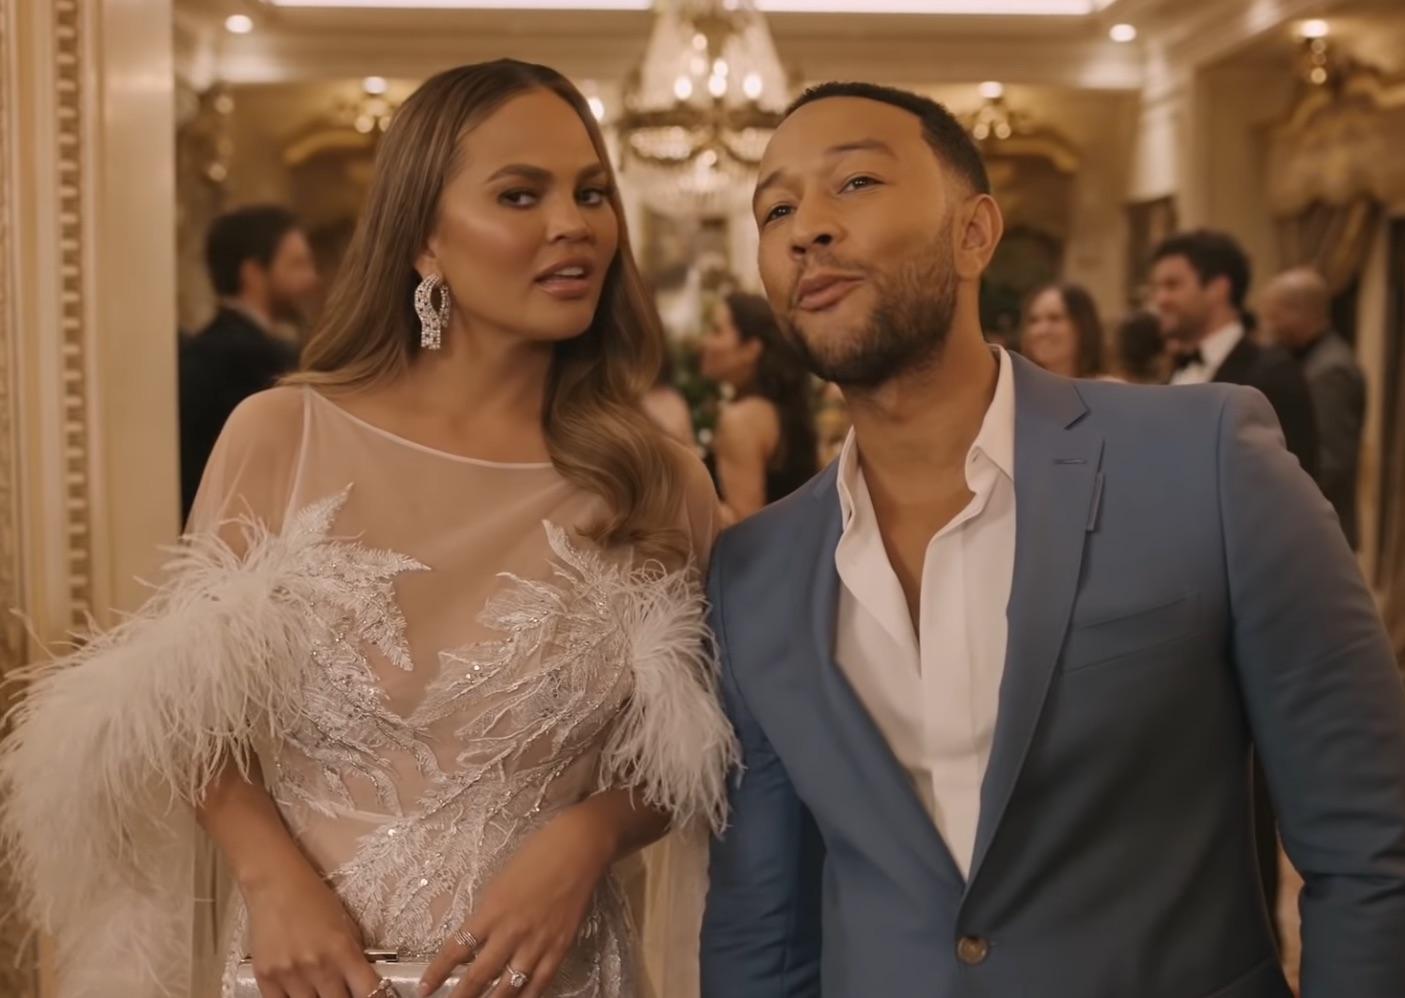 John Legend,Chrissy Teigen,  Super Bowl Glam Style Video